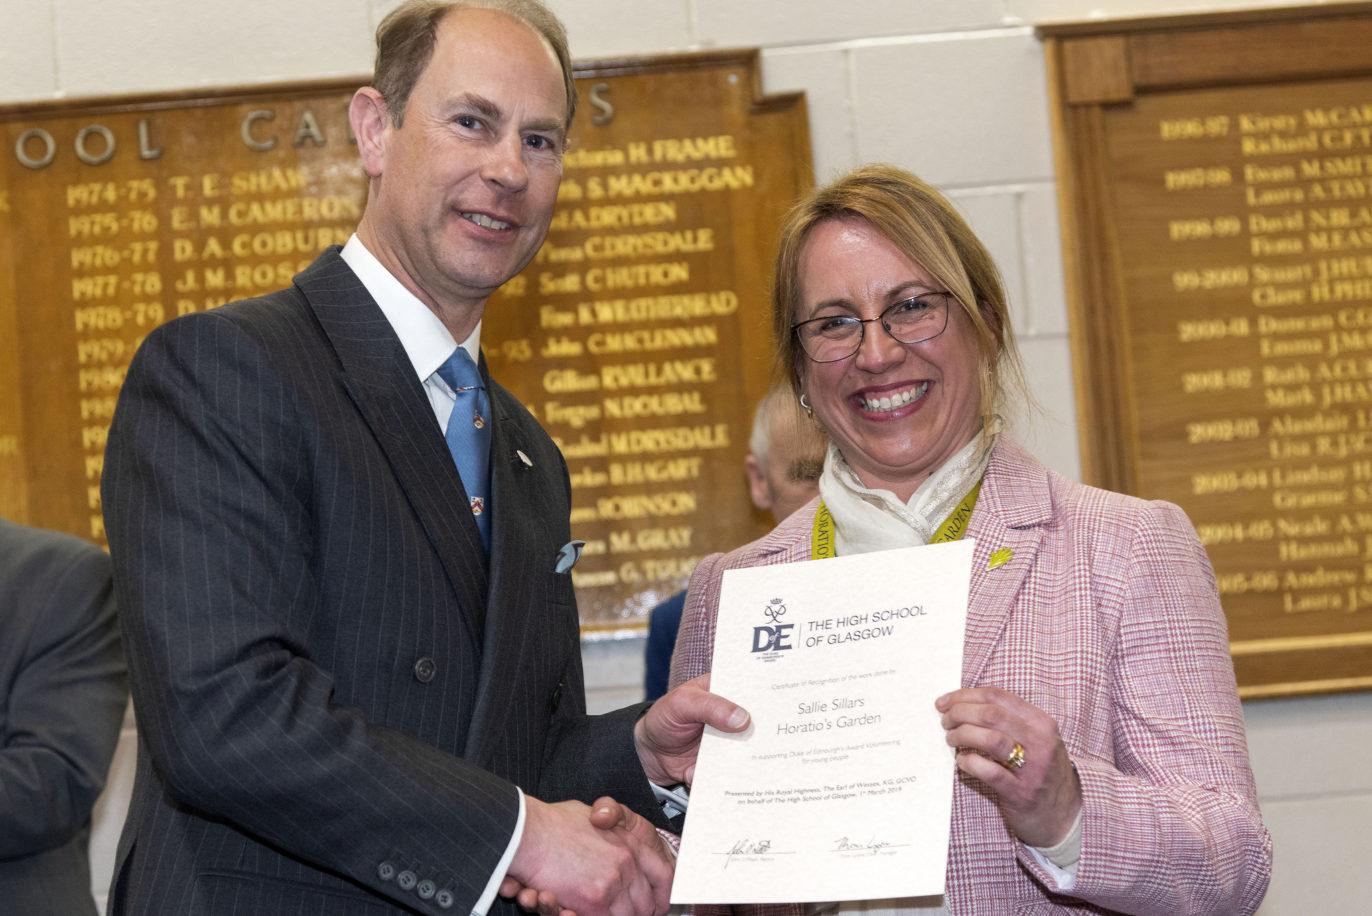 head gardener for Horatio's garden scotland receives certificate from the earl of wessex